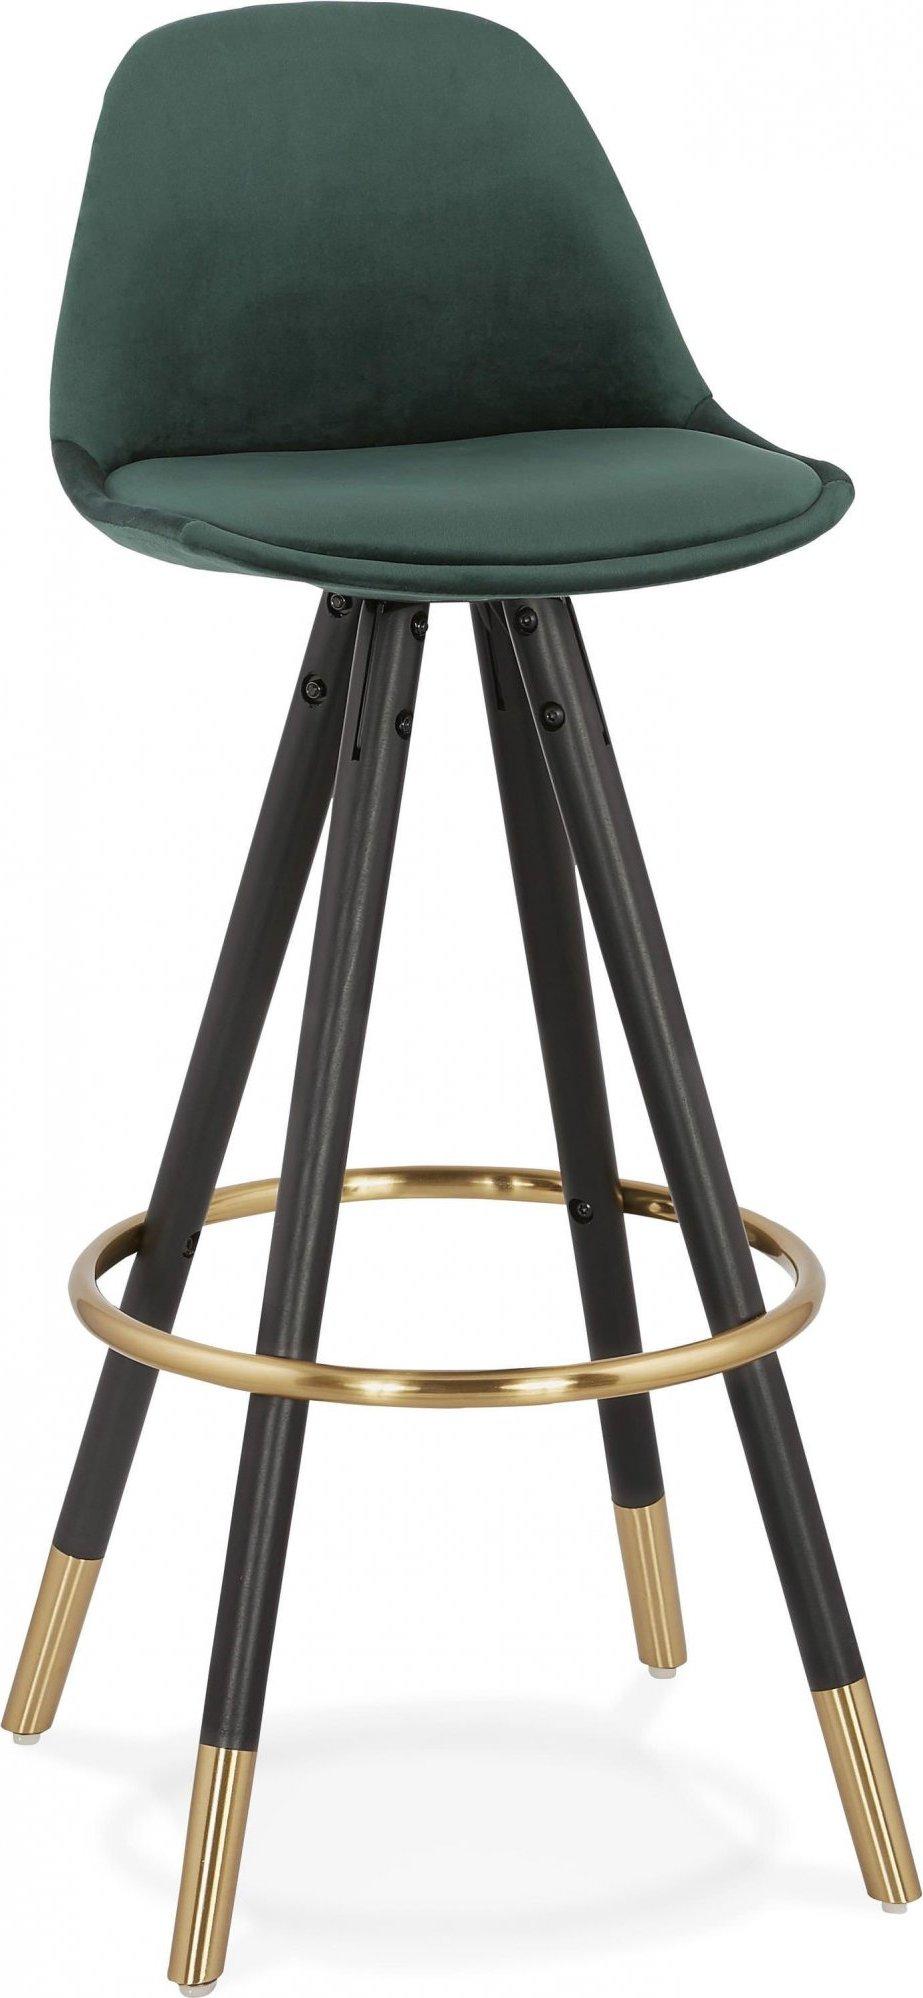 Tabouret de bar design bois noir et velours vert h97